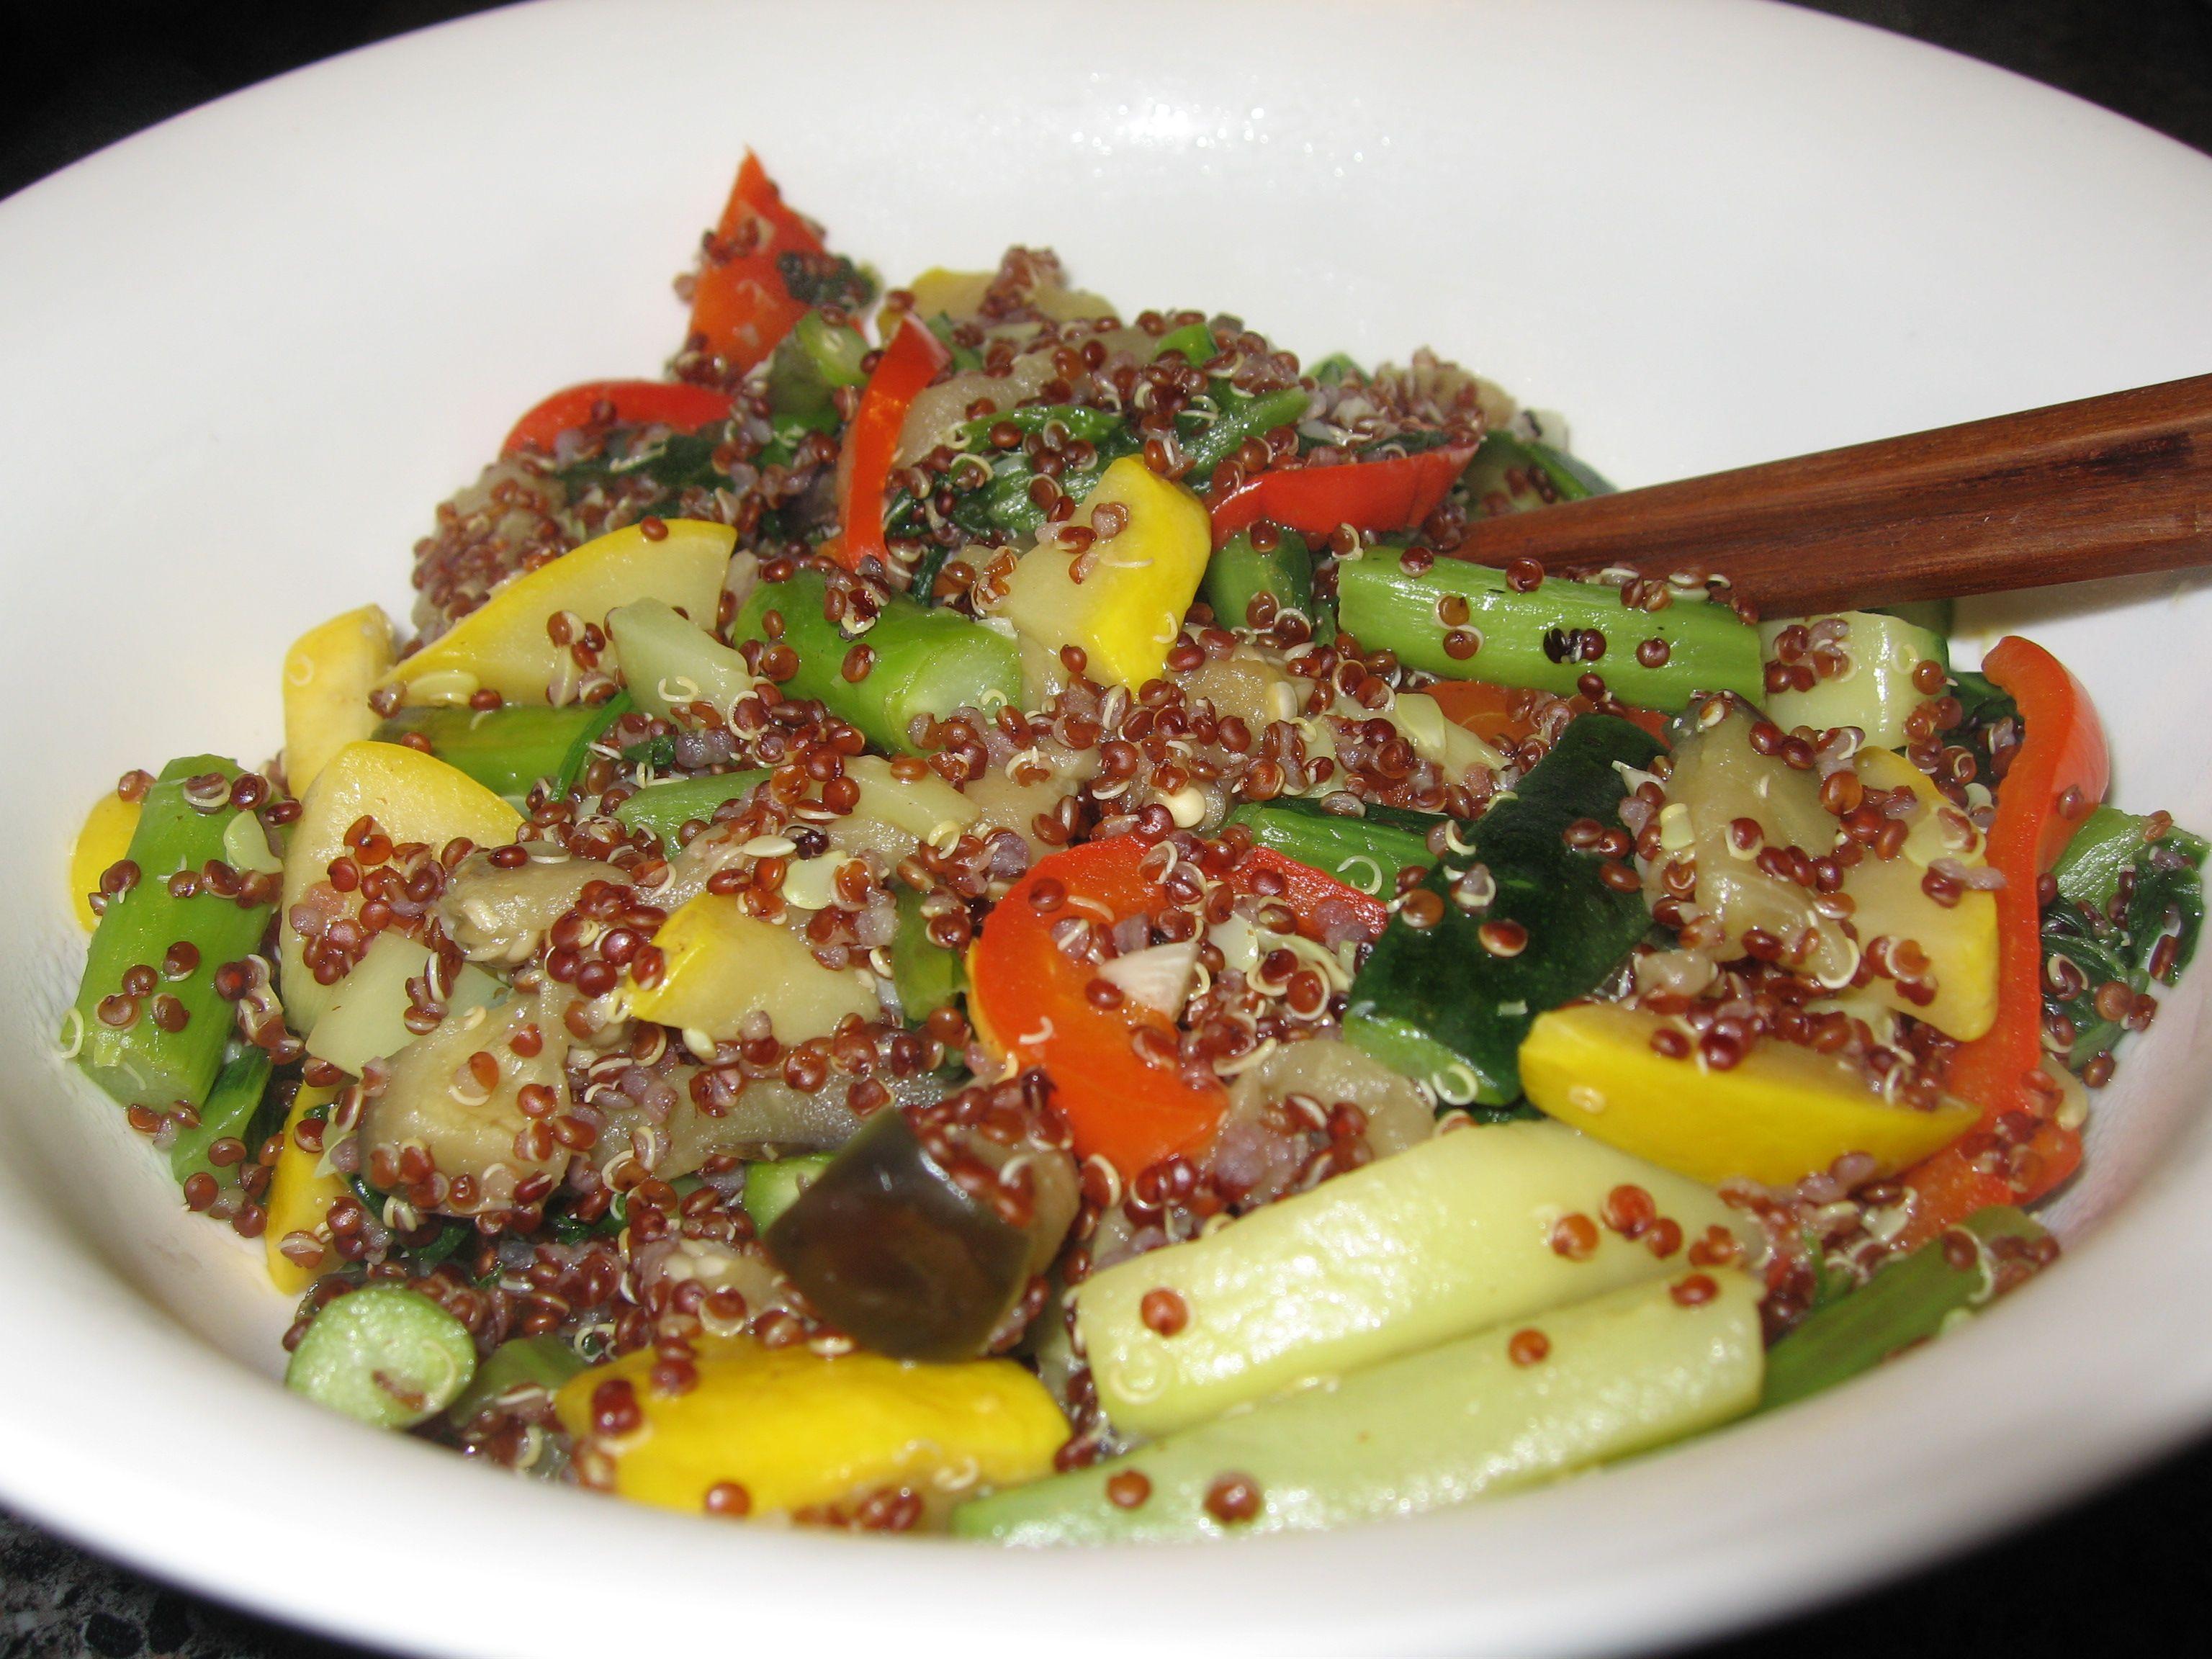 Meatless mondays inca red quinoa stir fry the veggie blog meatless mondays inca red quinoa stir fry the veggie blog forumfinder Images